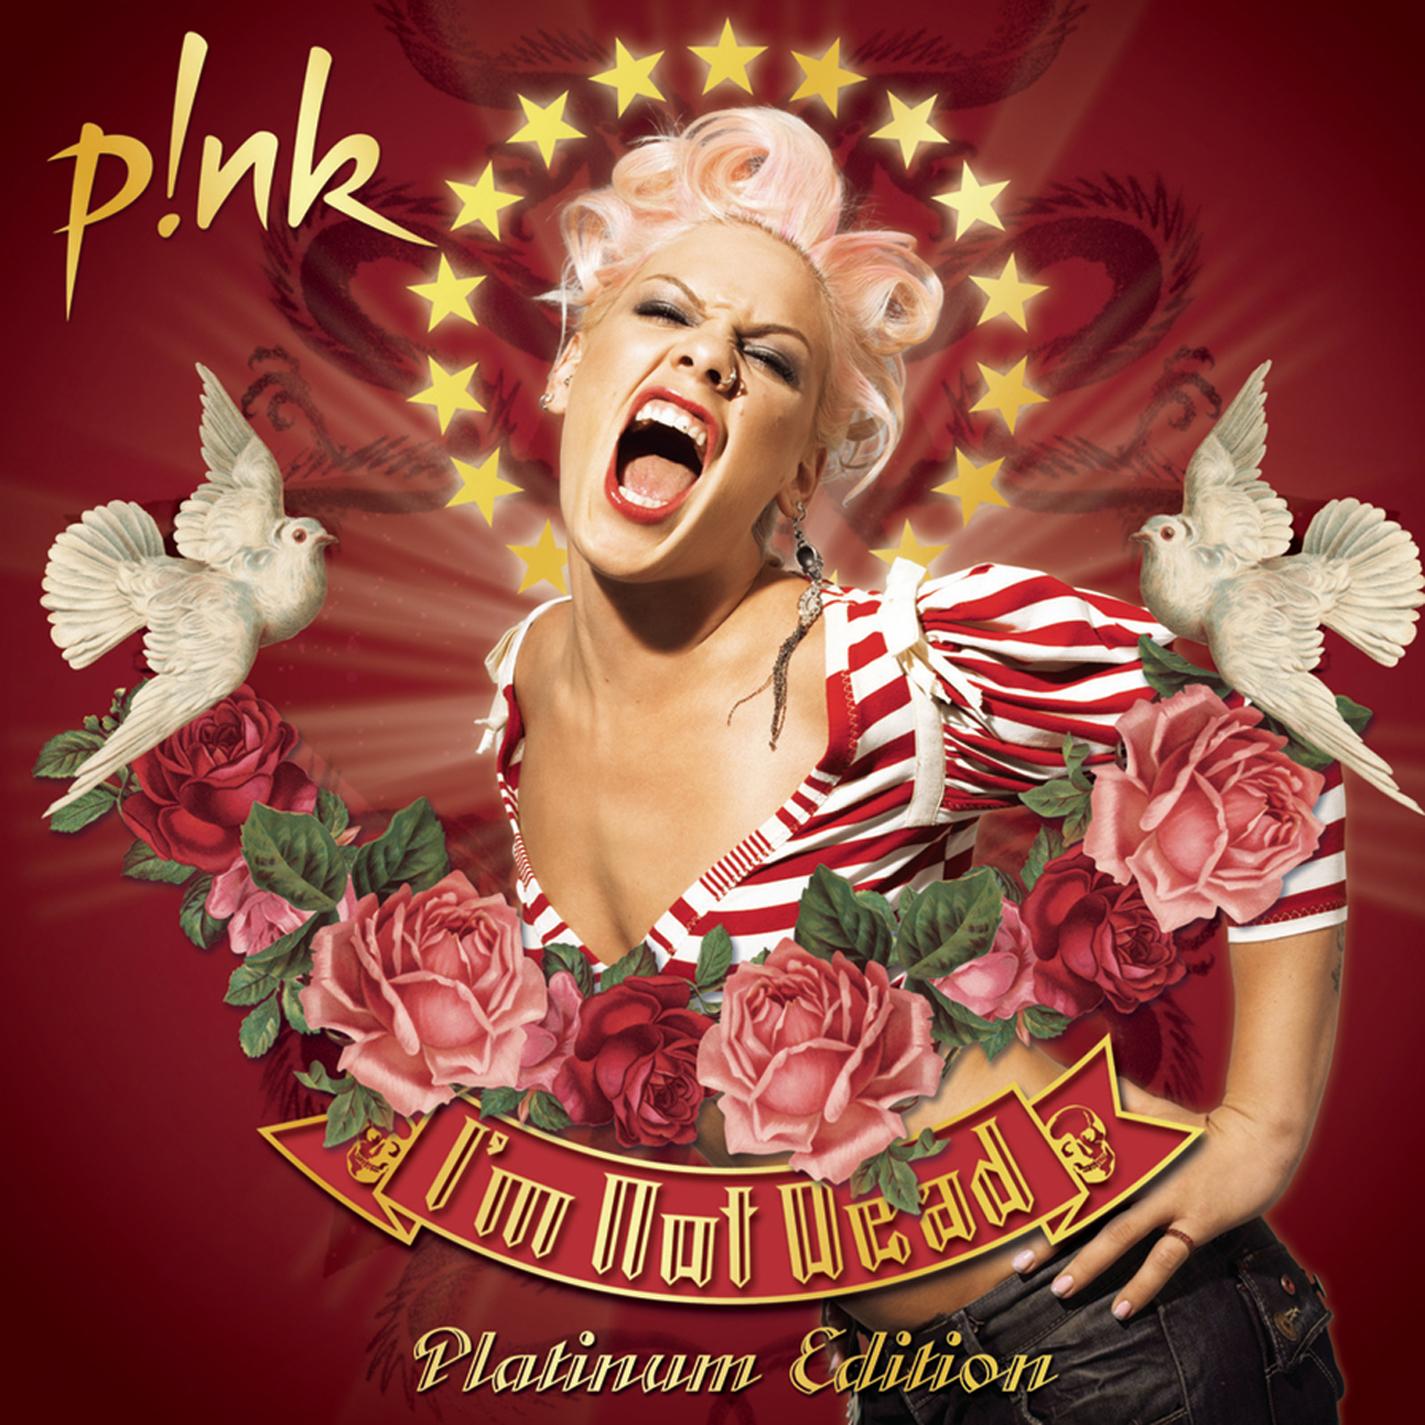 Pink Im Not Dead Tour